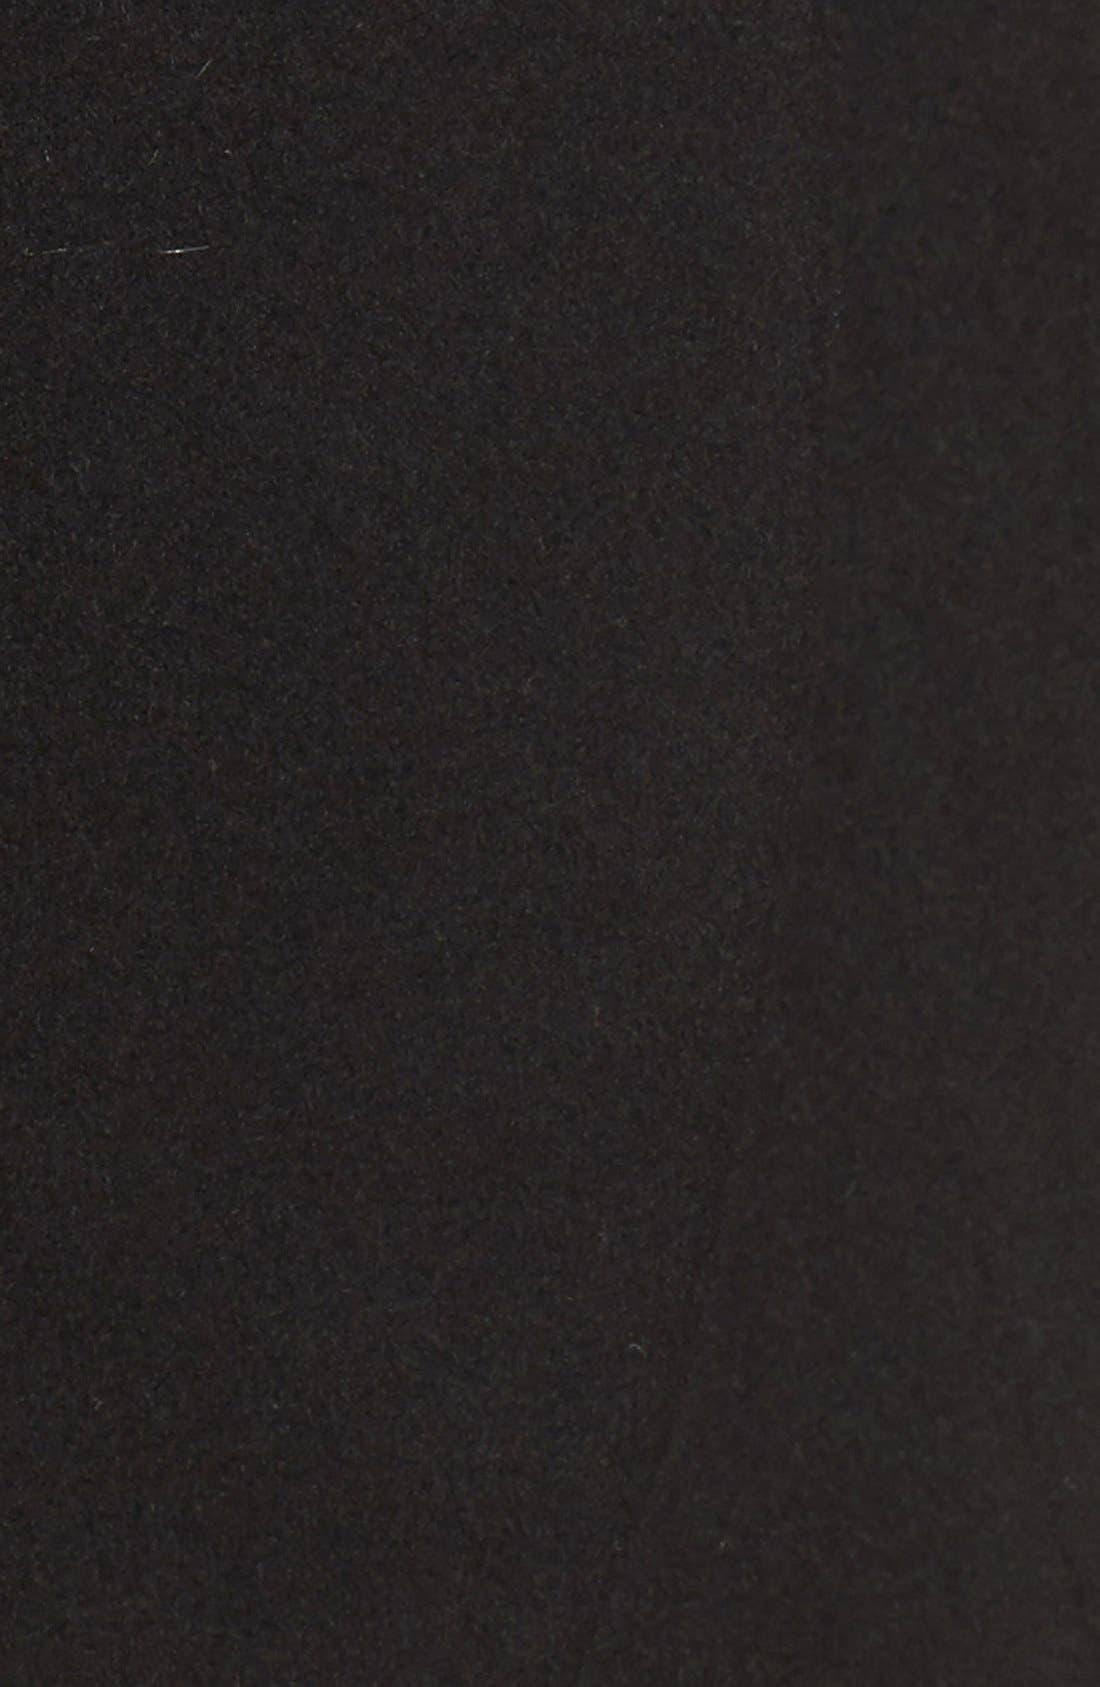 T Tahari Wool Blend Belted Wrap Coat,                             Alternate thumbnail 6, color,                             BLACK